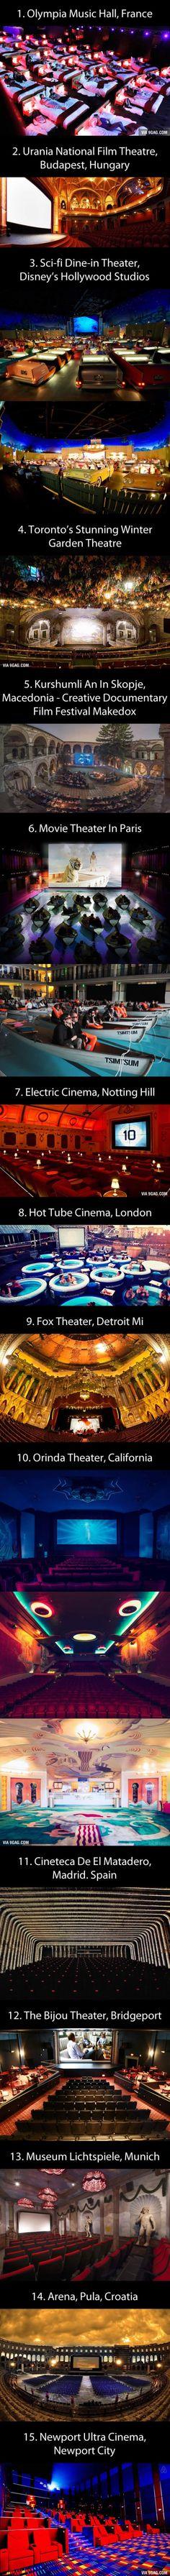 15 Of The Most Beautiful Cinemas Around The World